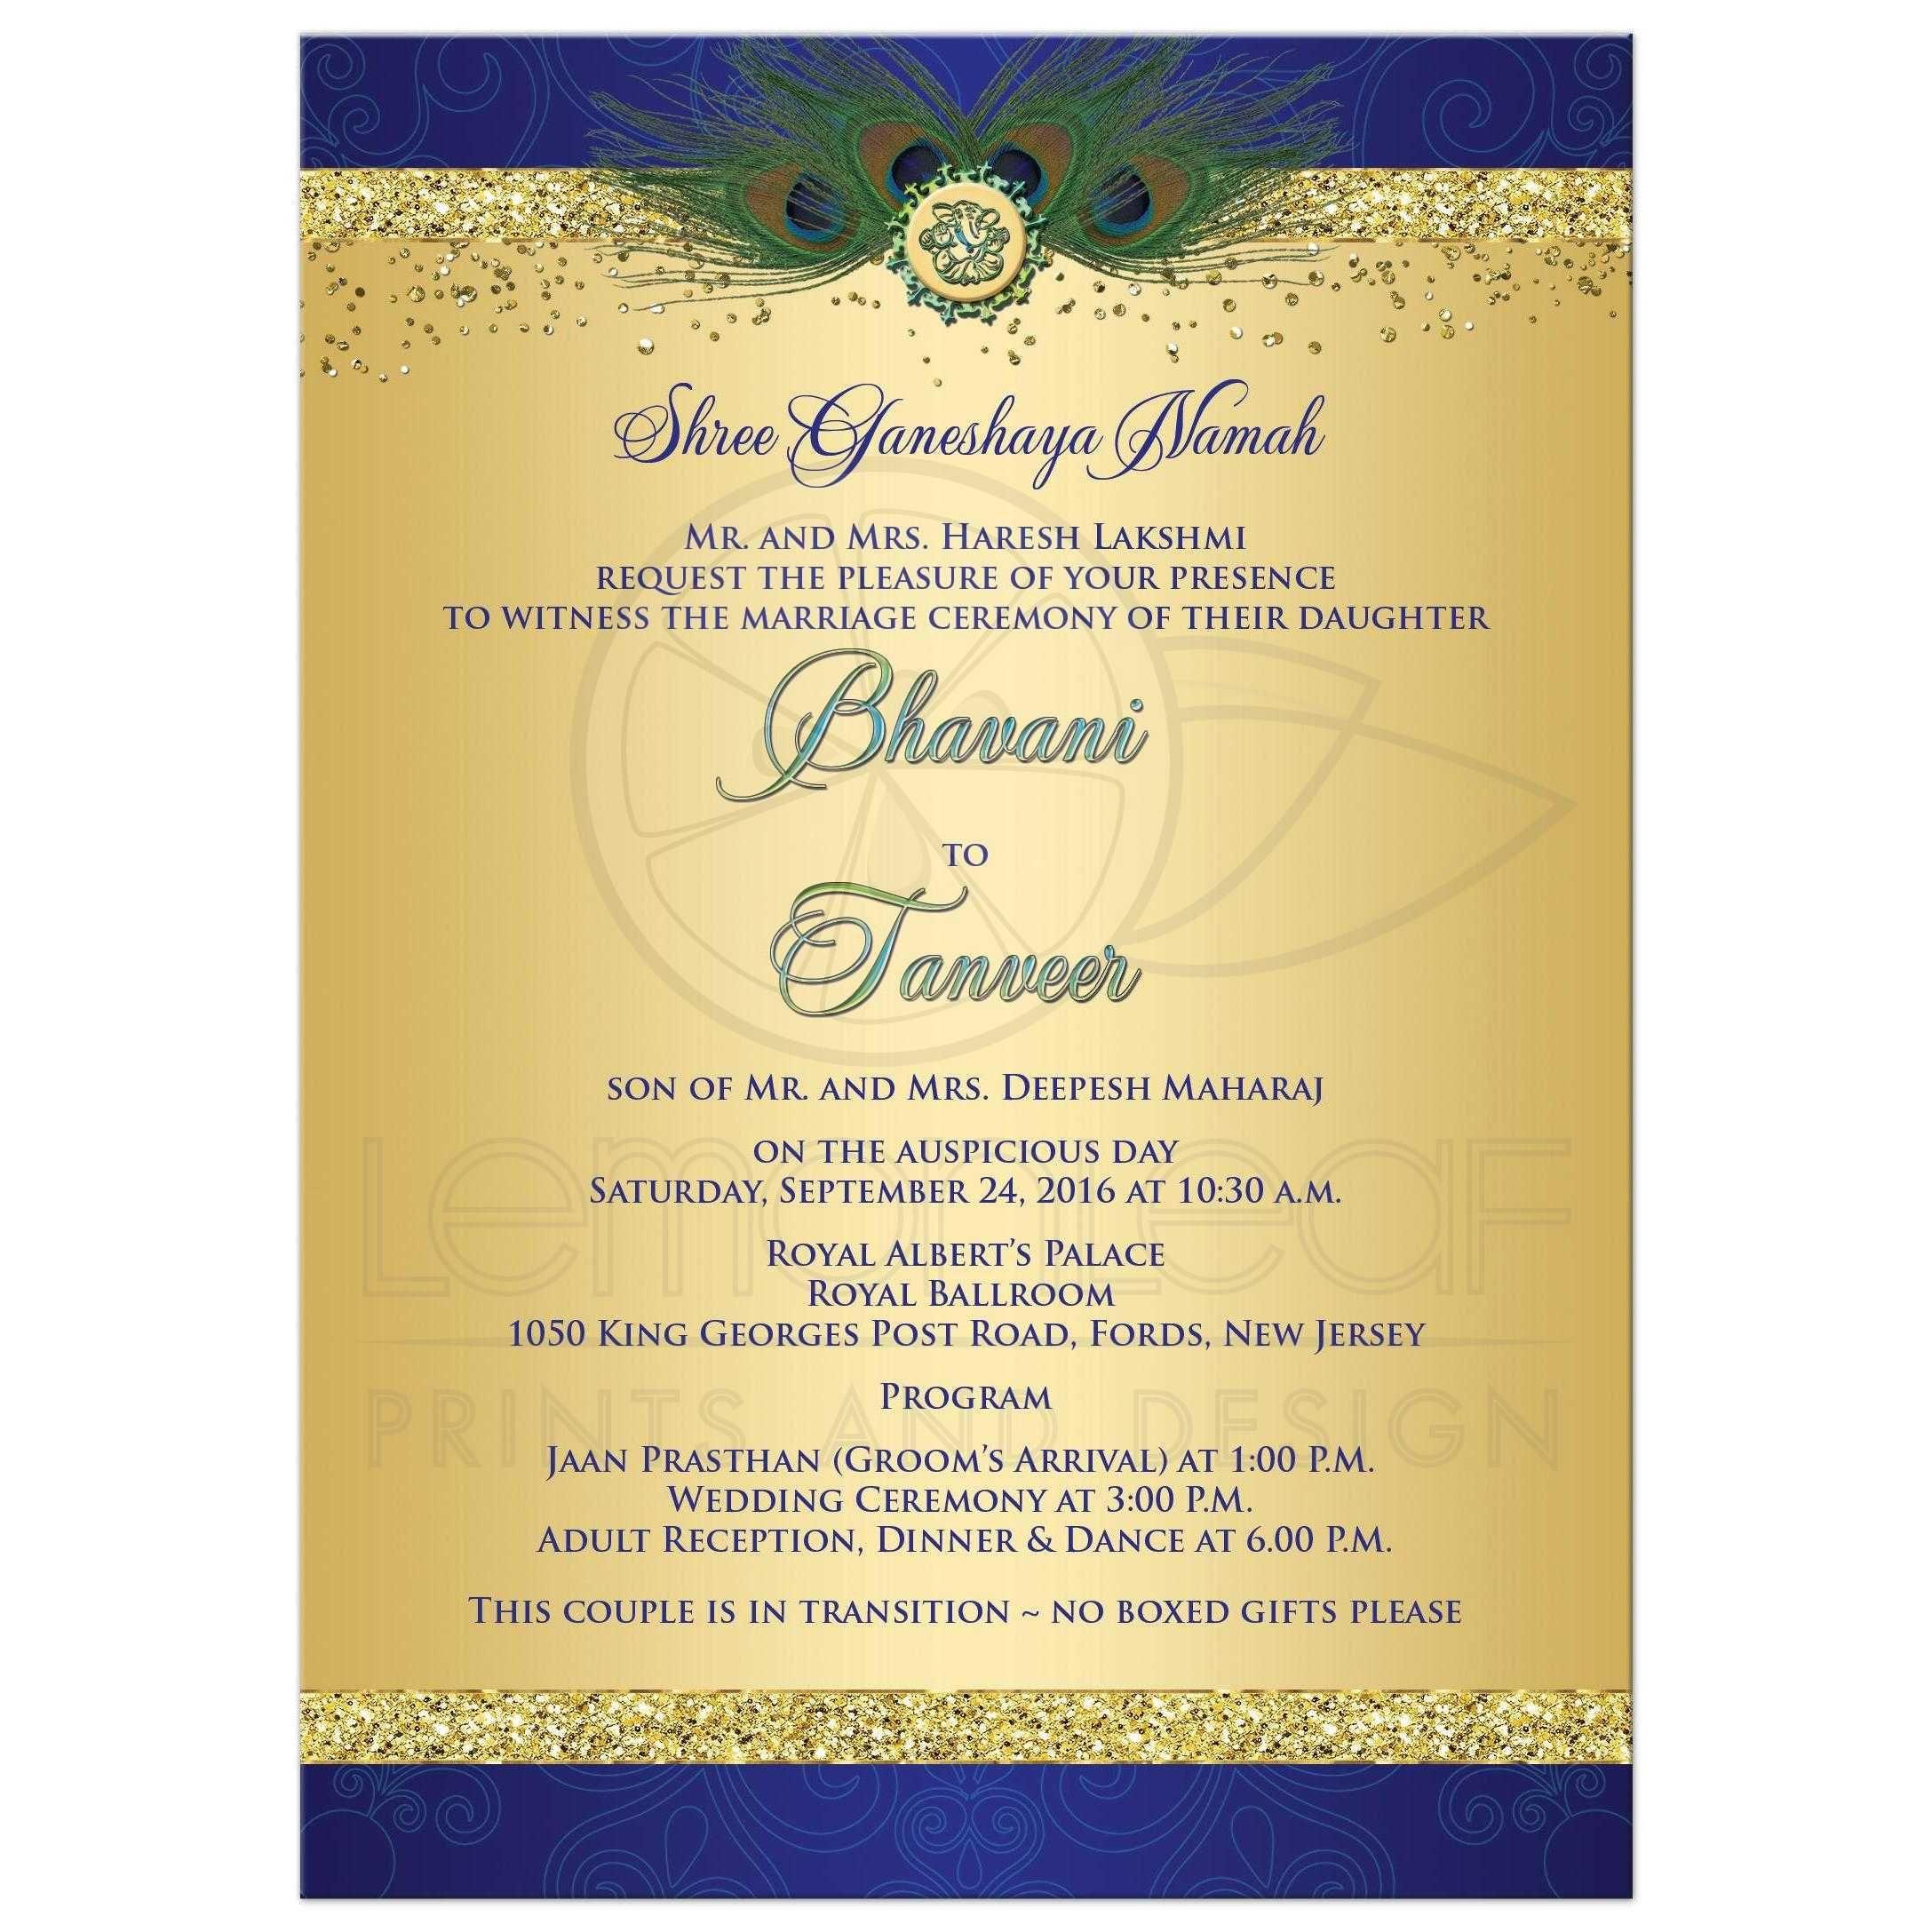 Indian Wedding Invitation Cards Indian Wedding Invitation Cards – Indian Invitation Cards Uk